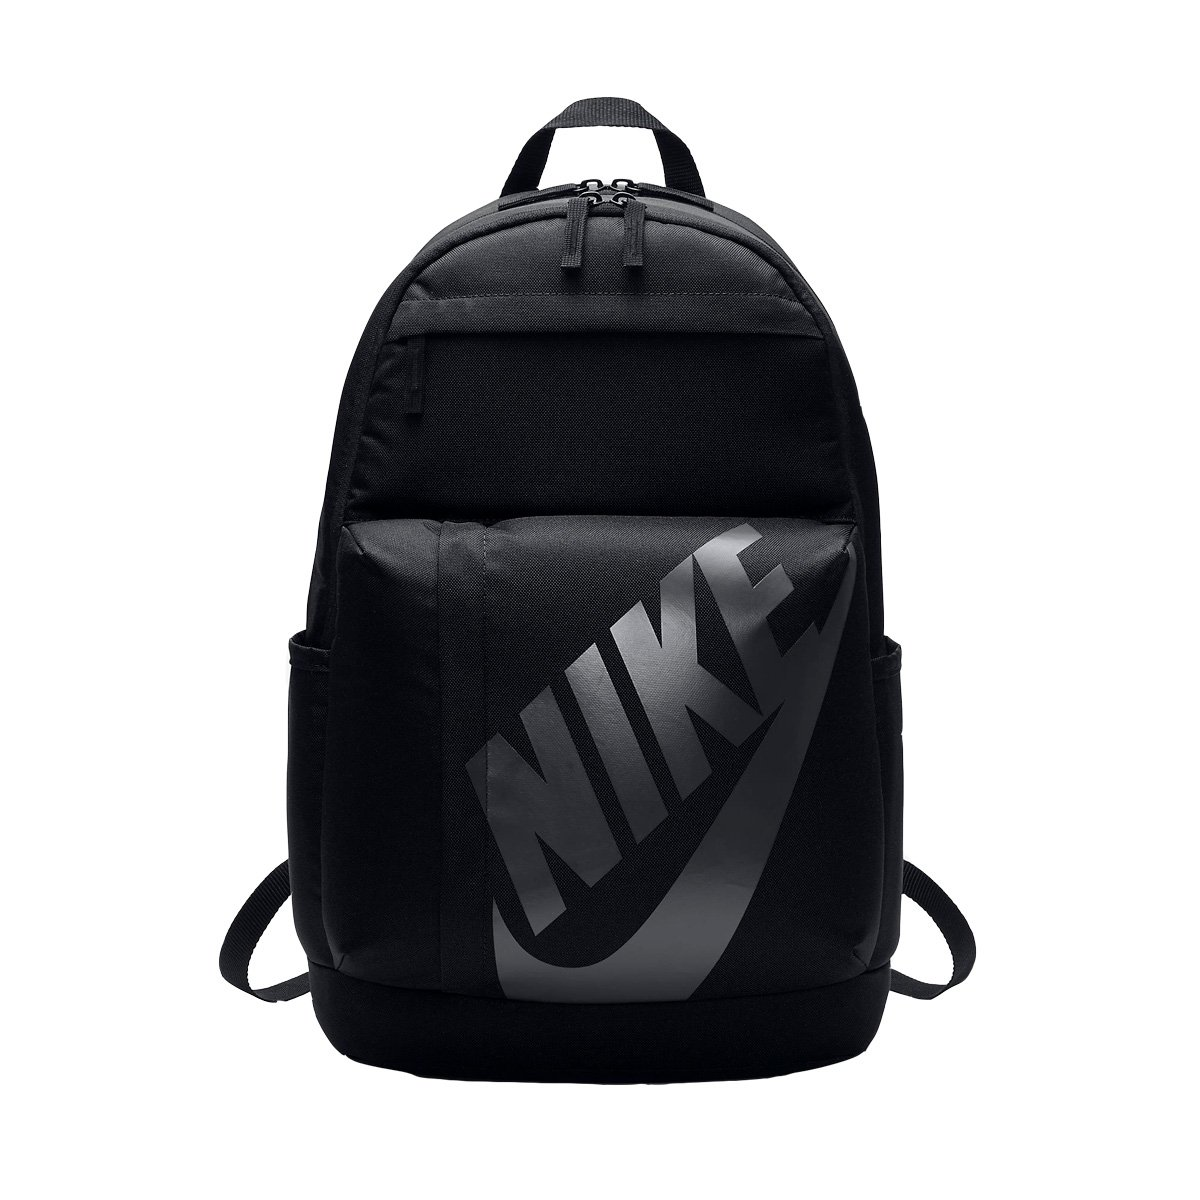 da0b5c1d9 Bizz Store - Mochila Nike Element Backpack Esportiva Unissex